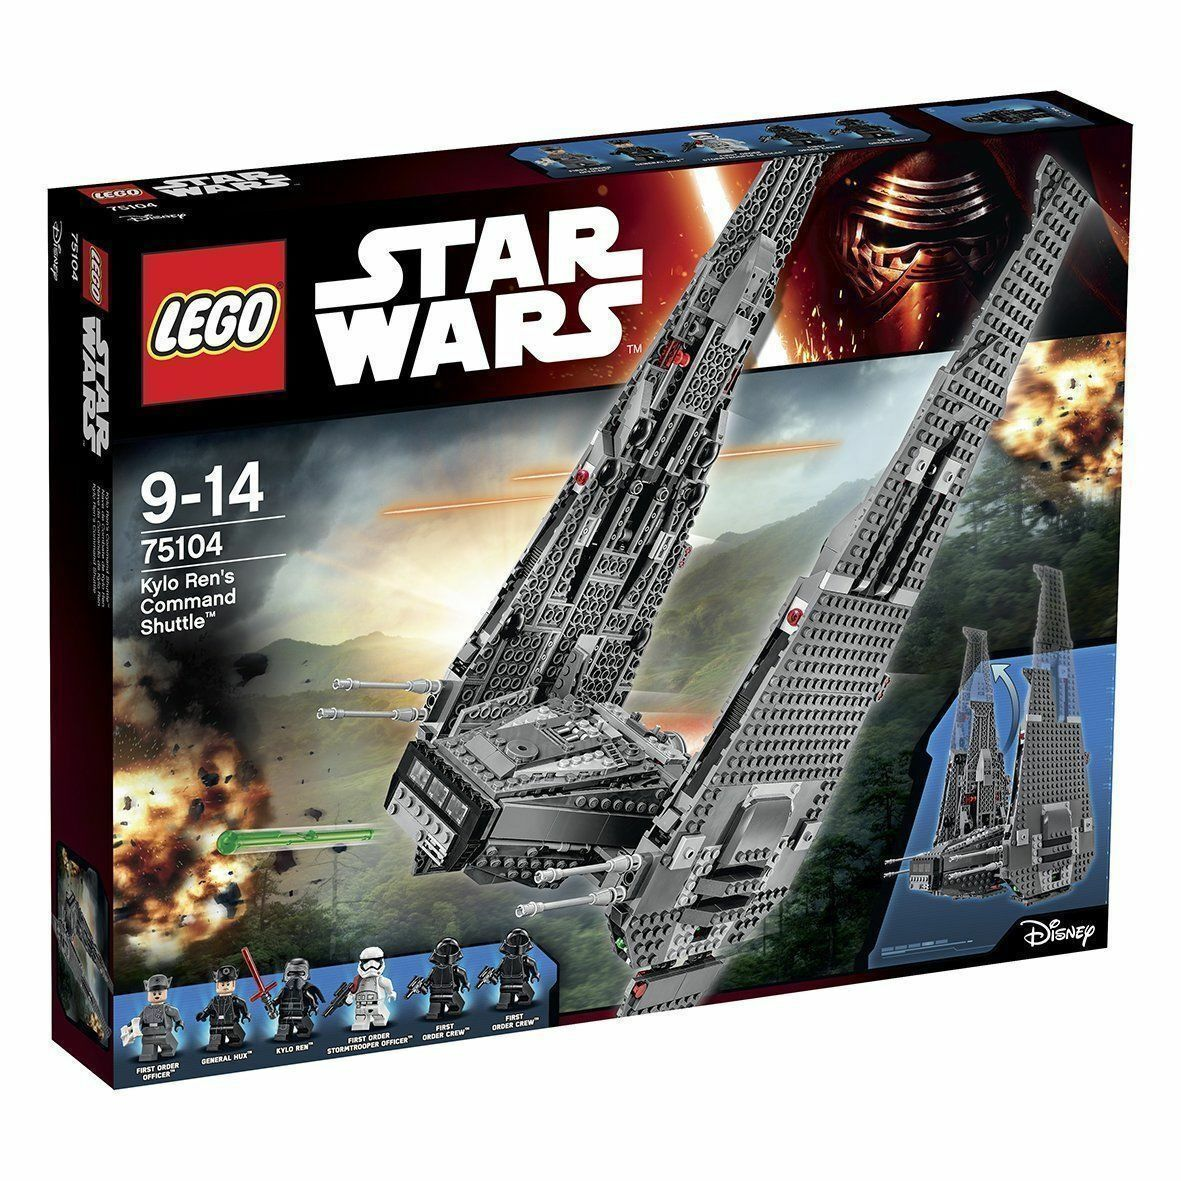 LEGO STAR WARS 9-14 ANNI KYLO REN COMMAND SHUTTLE ART 75104